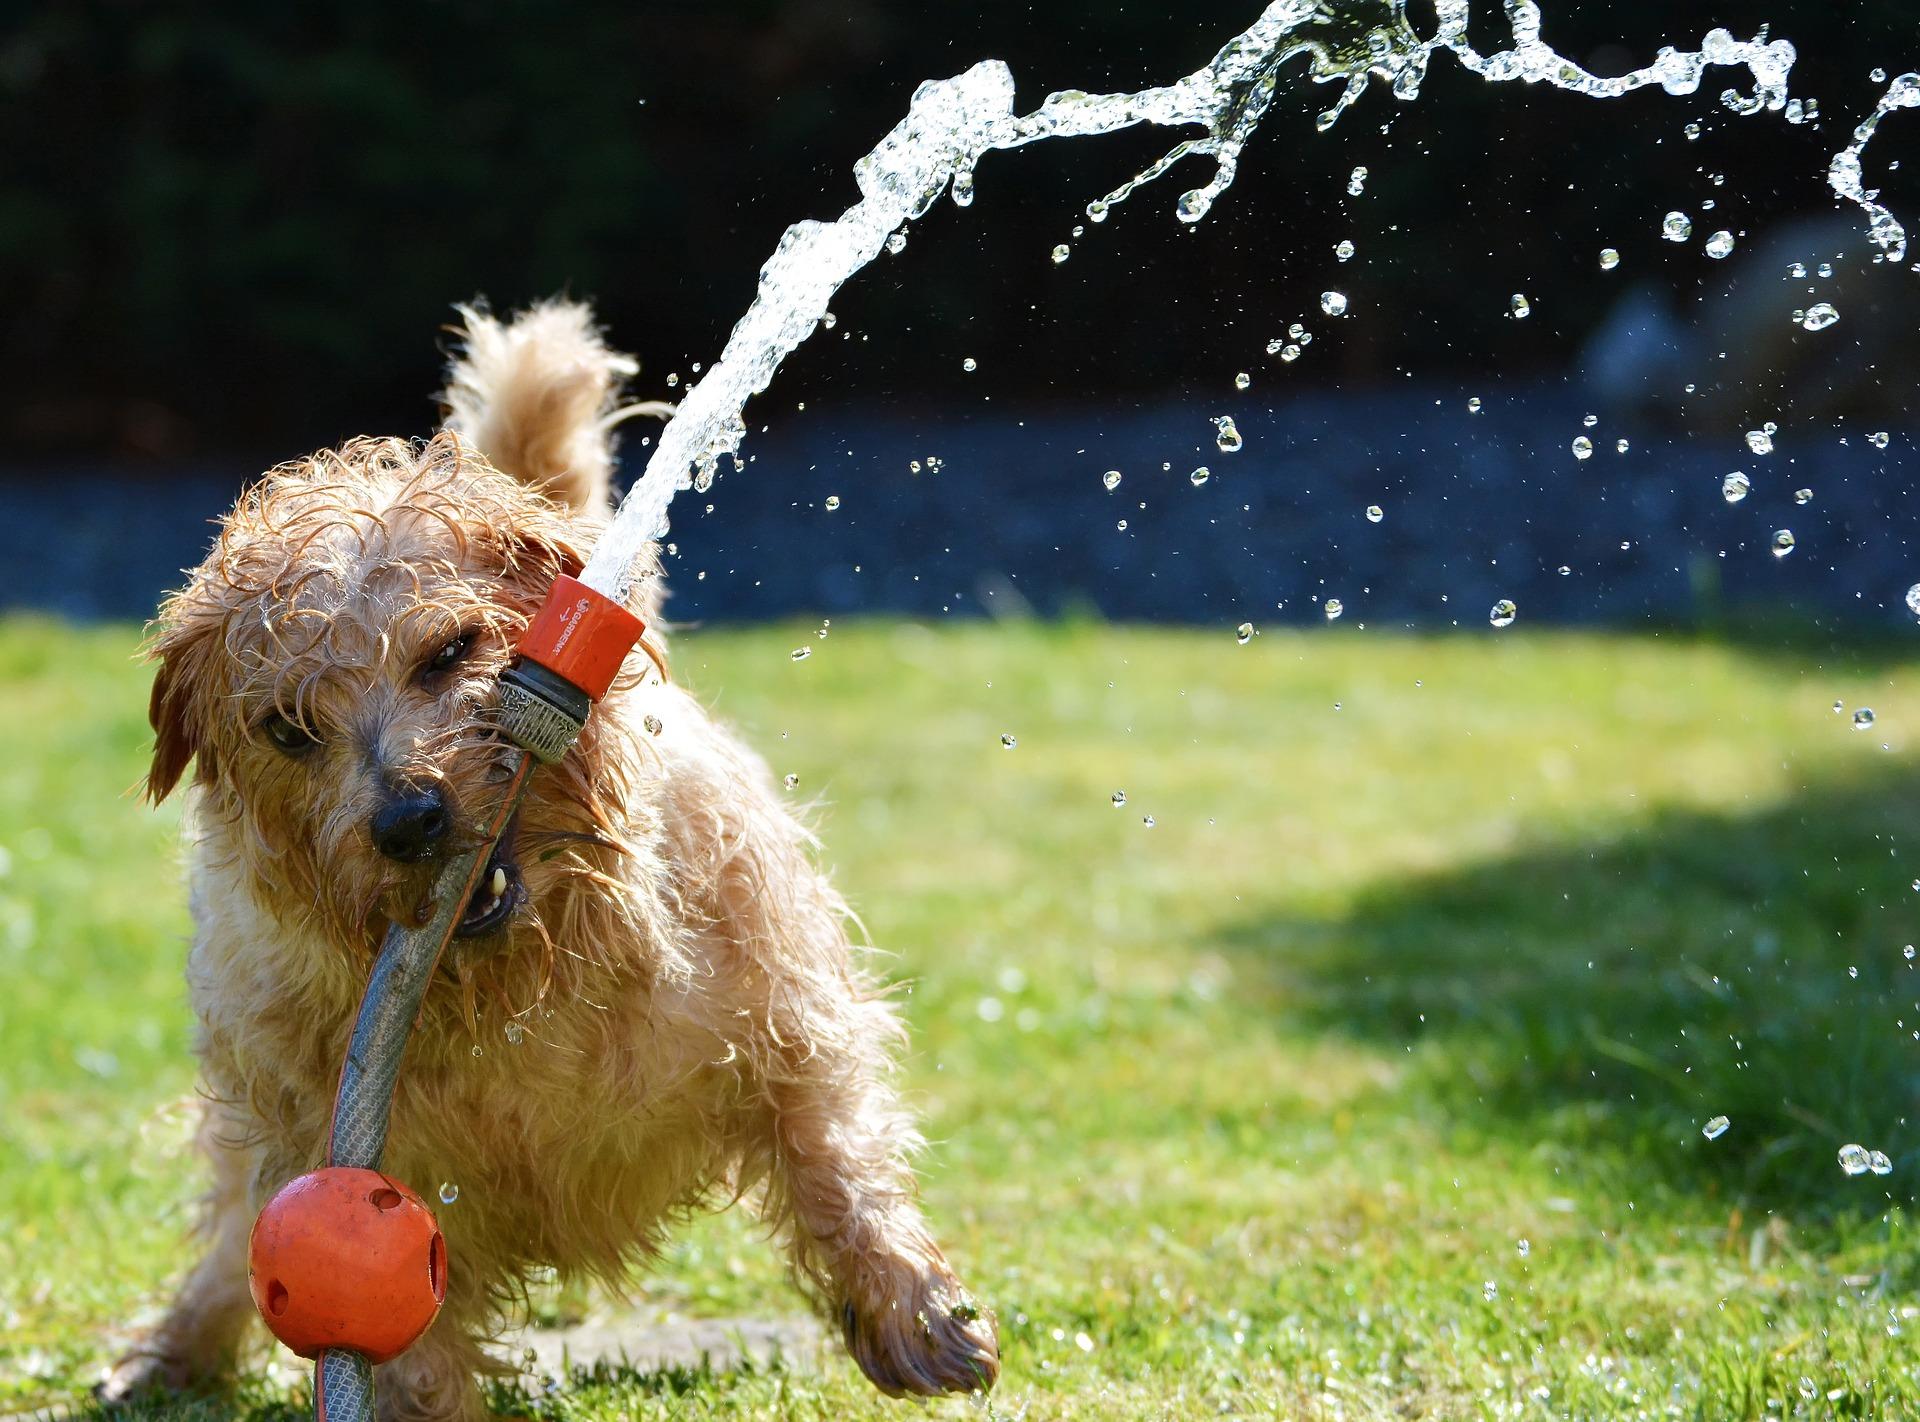 perro, حديقالكلبrier, متعة, خرطوم - خلفيات عالية الدقة - أستاذ falken.com